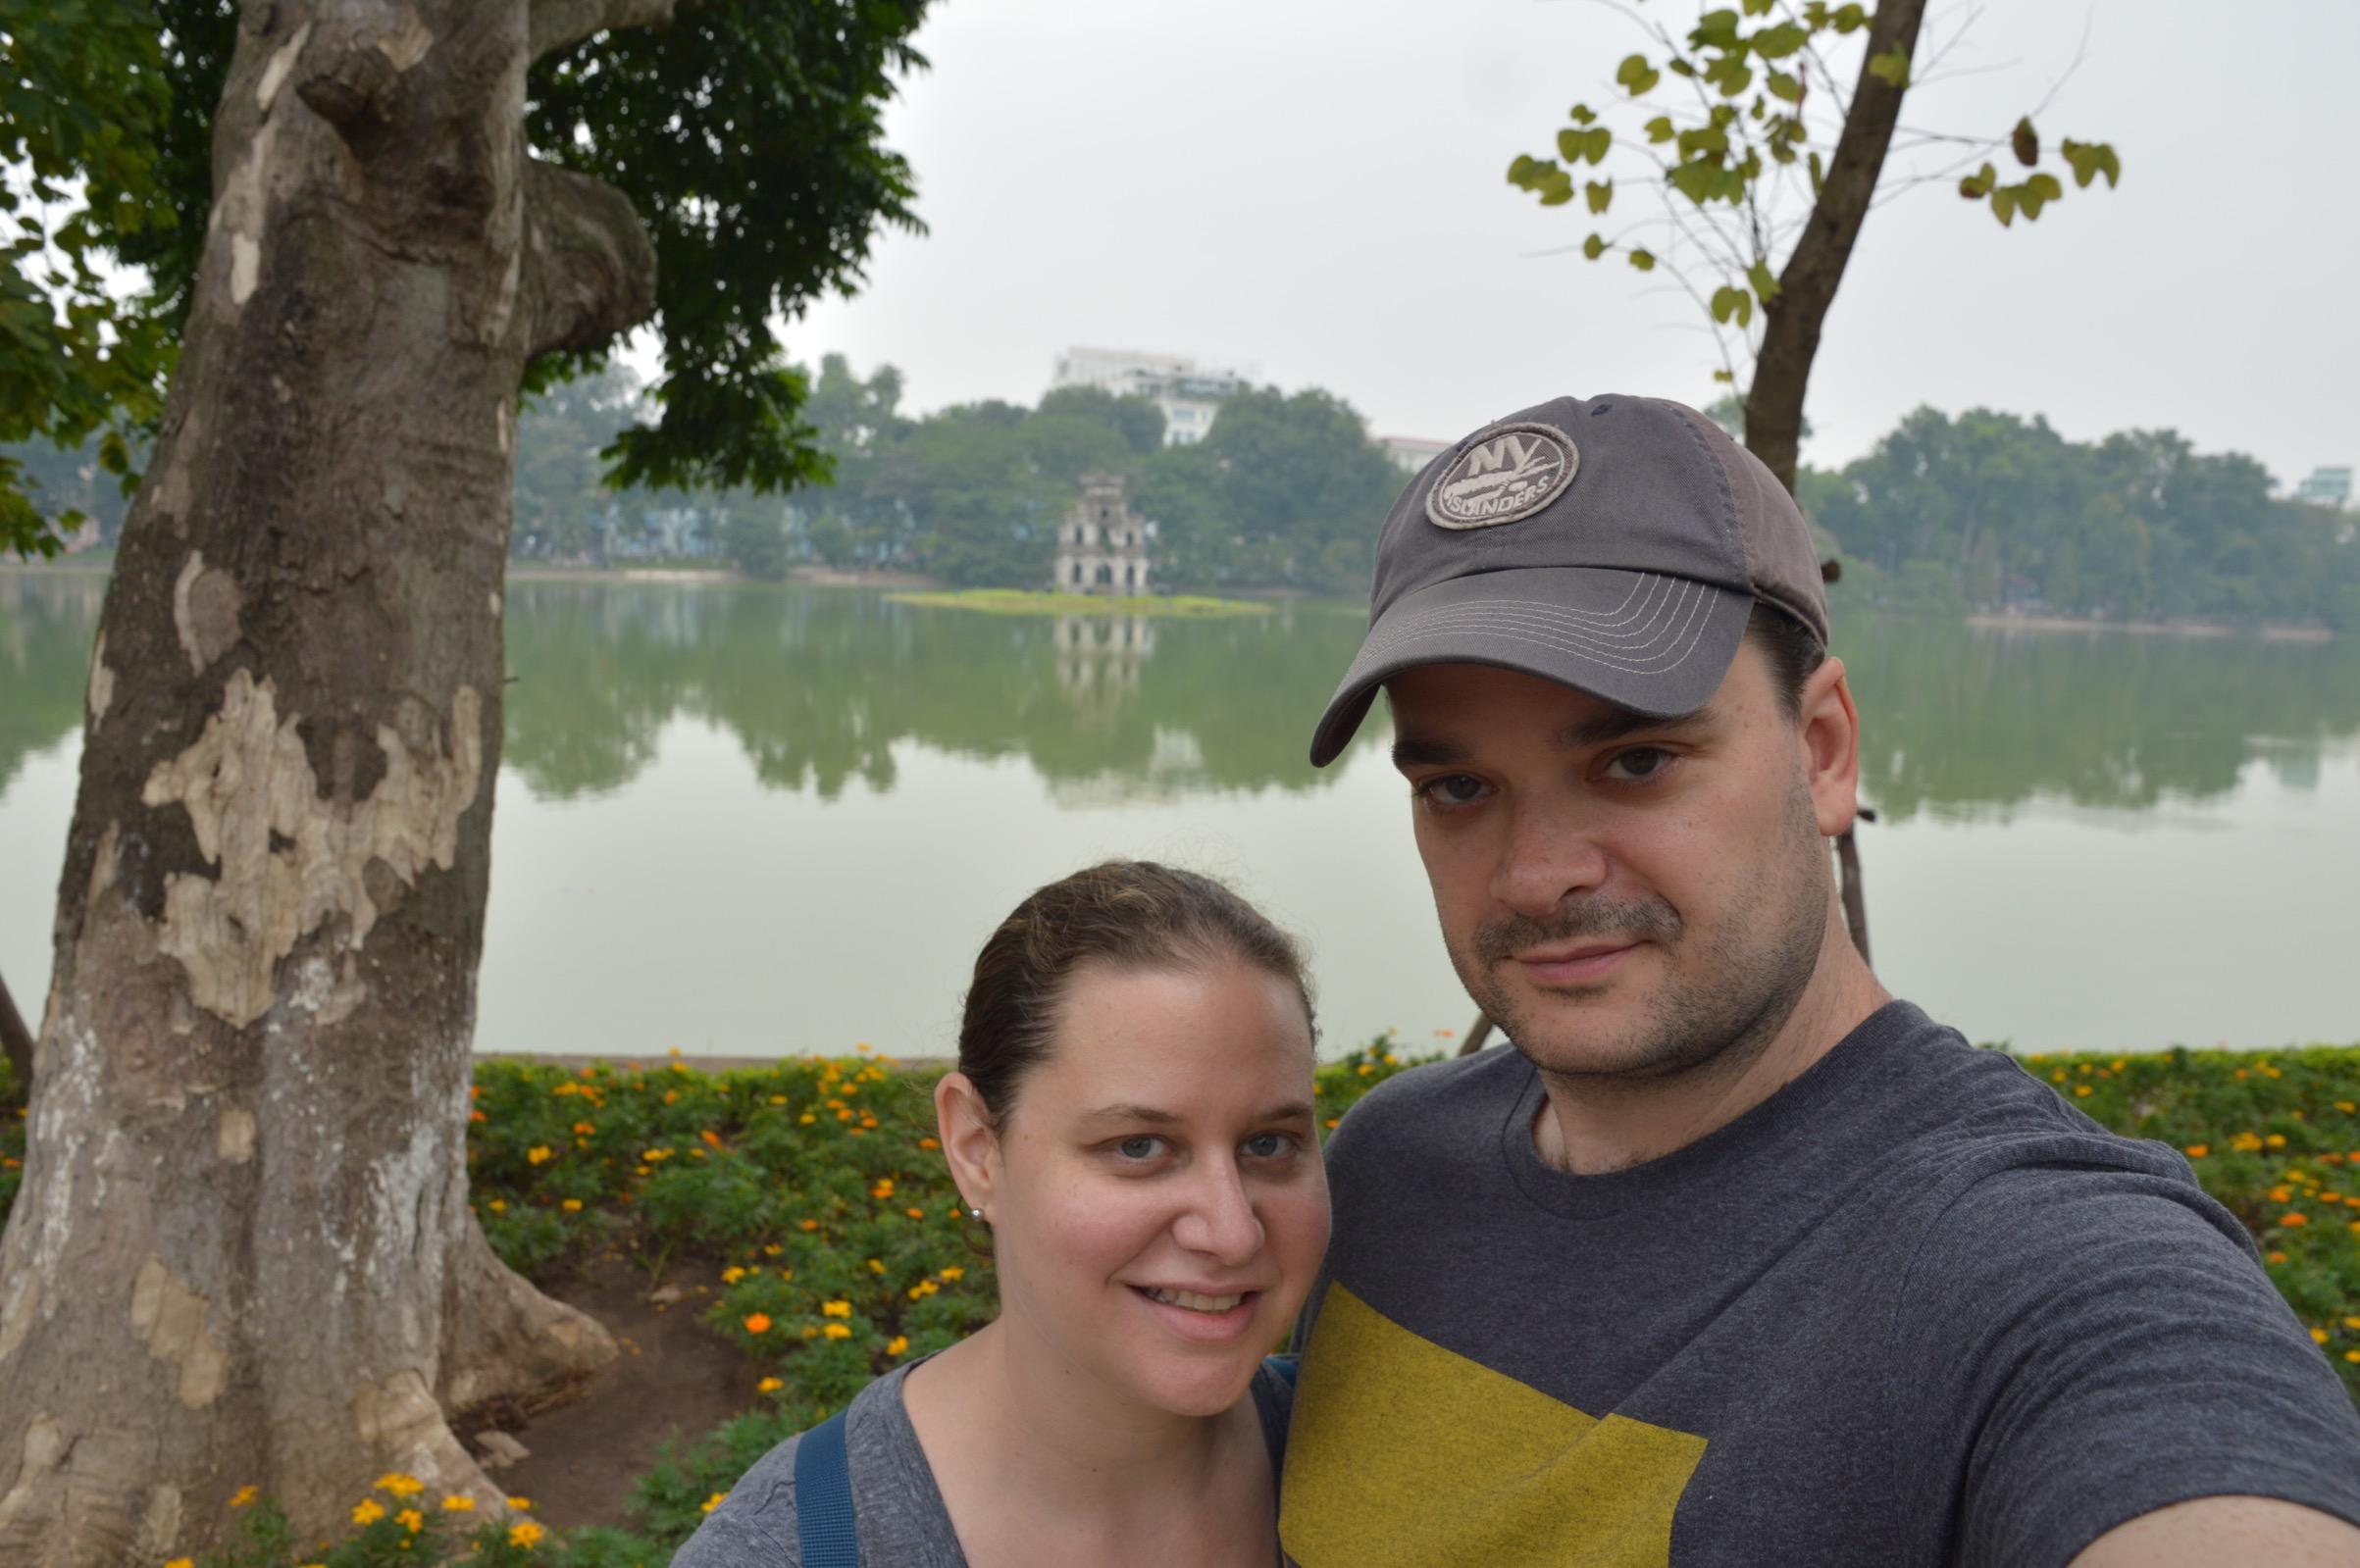 One longer stop on our world trip: Hoàn Kiếm Lake and Turtle Tower, Hanoi, Vietnam